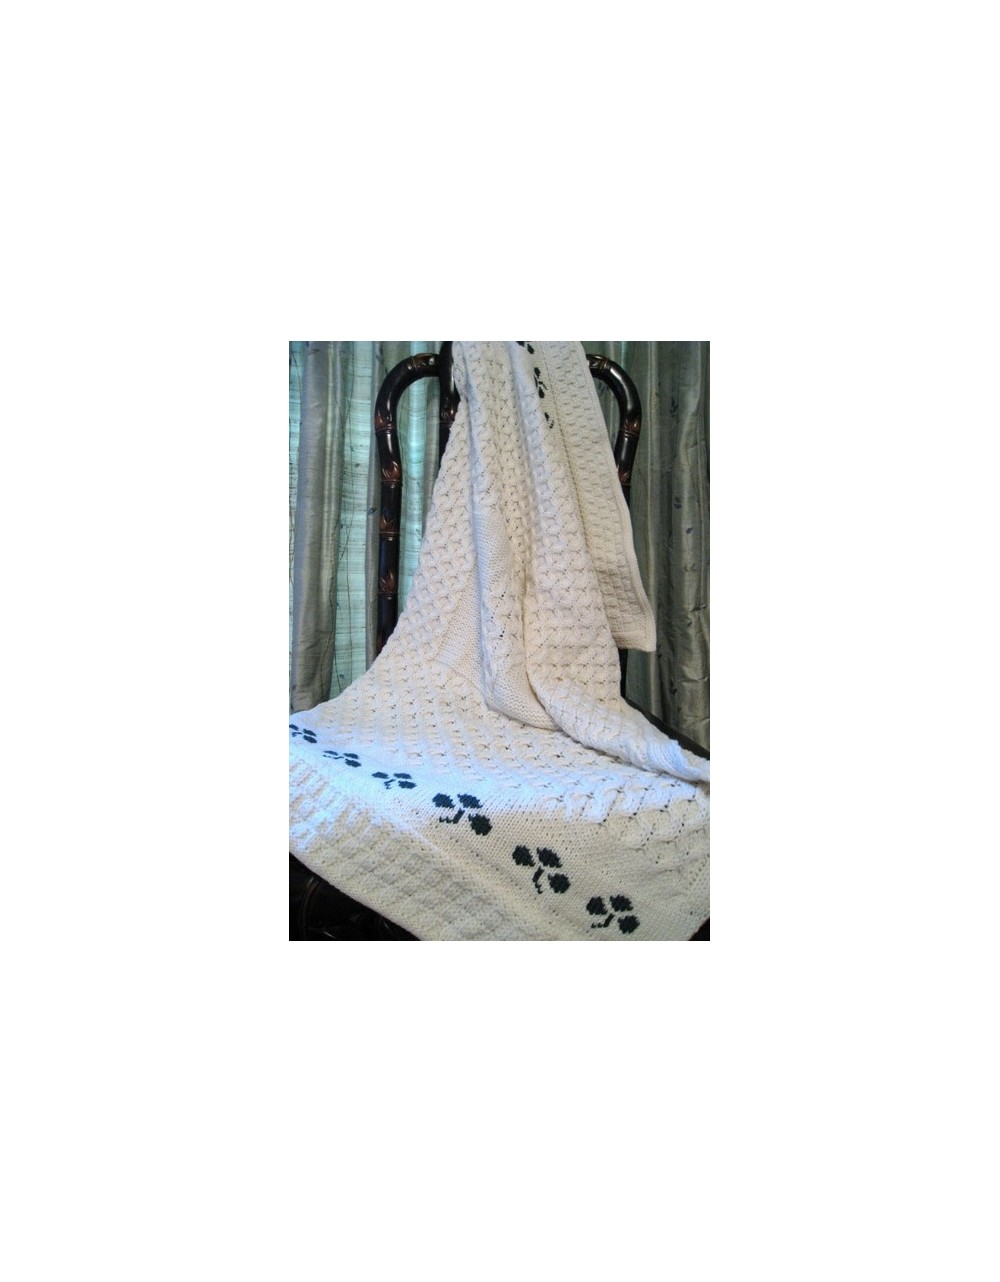 BABY SHAMROCK BLANKET Aran Knitwear Specials Kids Irish Handcrafts